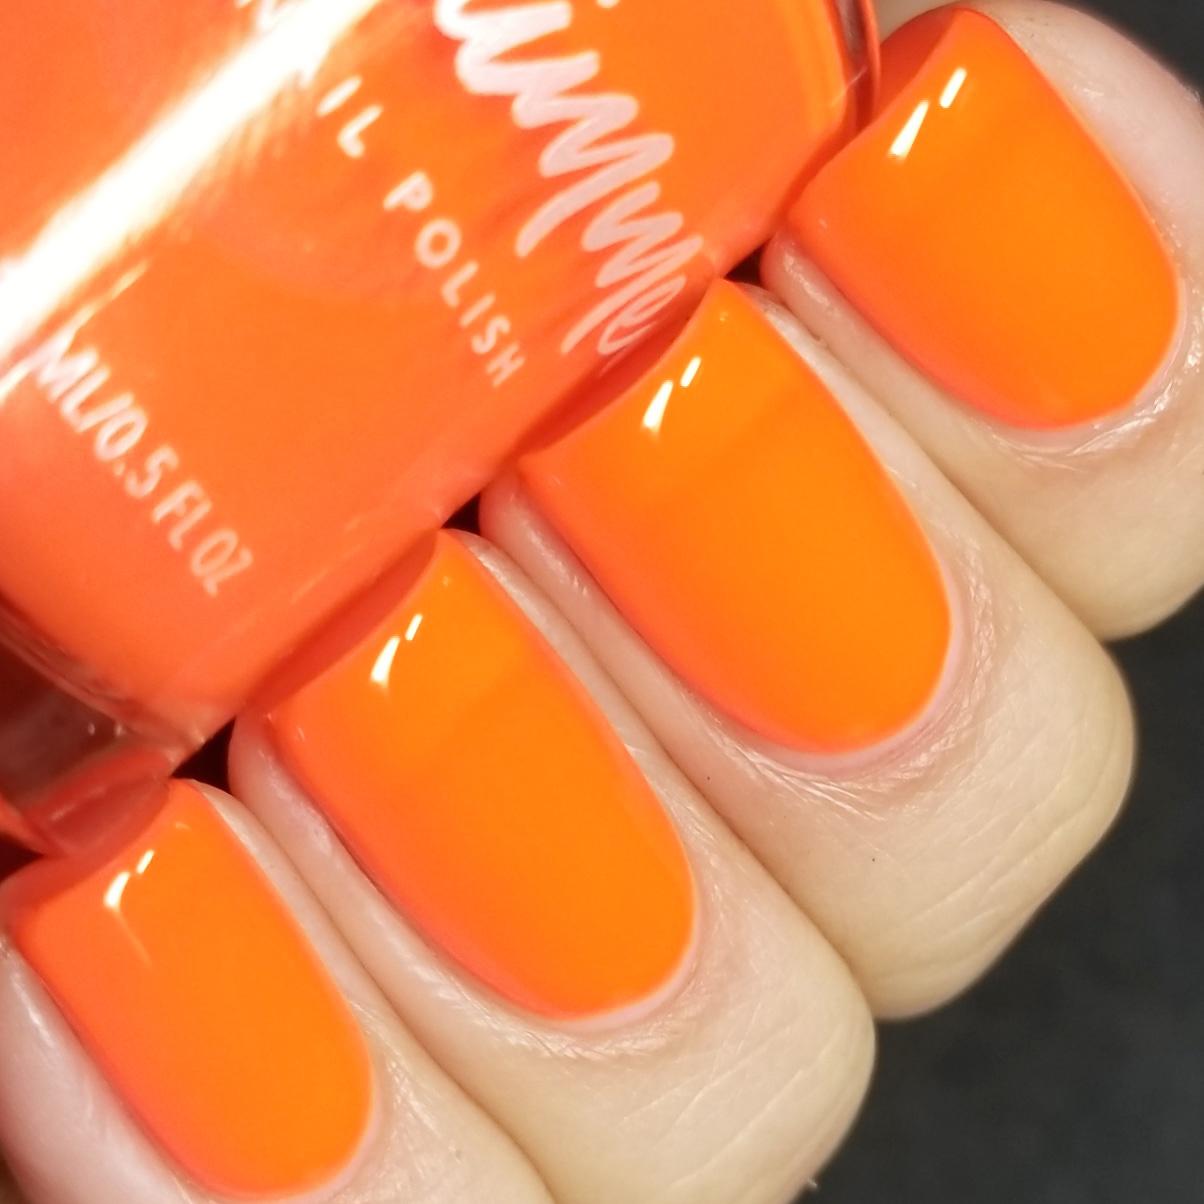 KBShimmer Please Don\'t Glow Girl Neon Orange Cream Nail Polish